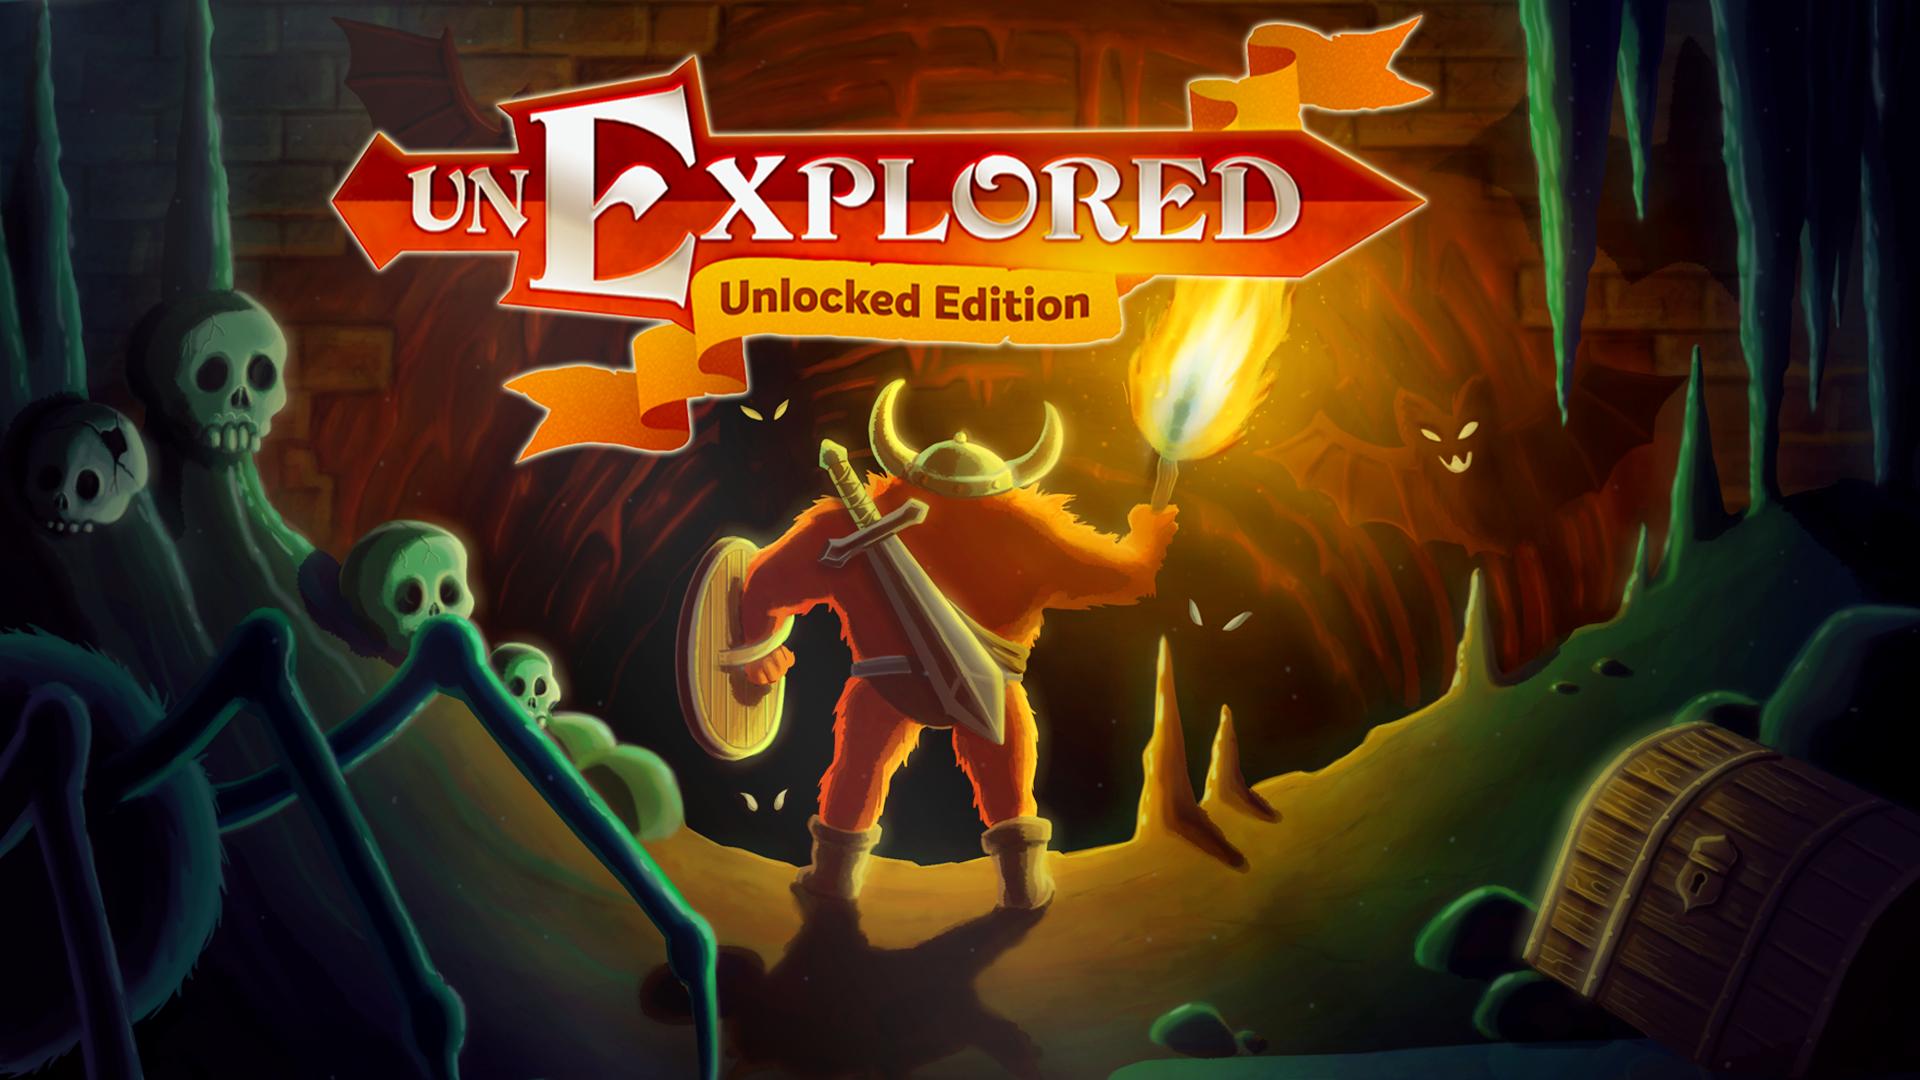 Unexplored :: Unexplored is coming to Nintendo Switch